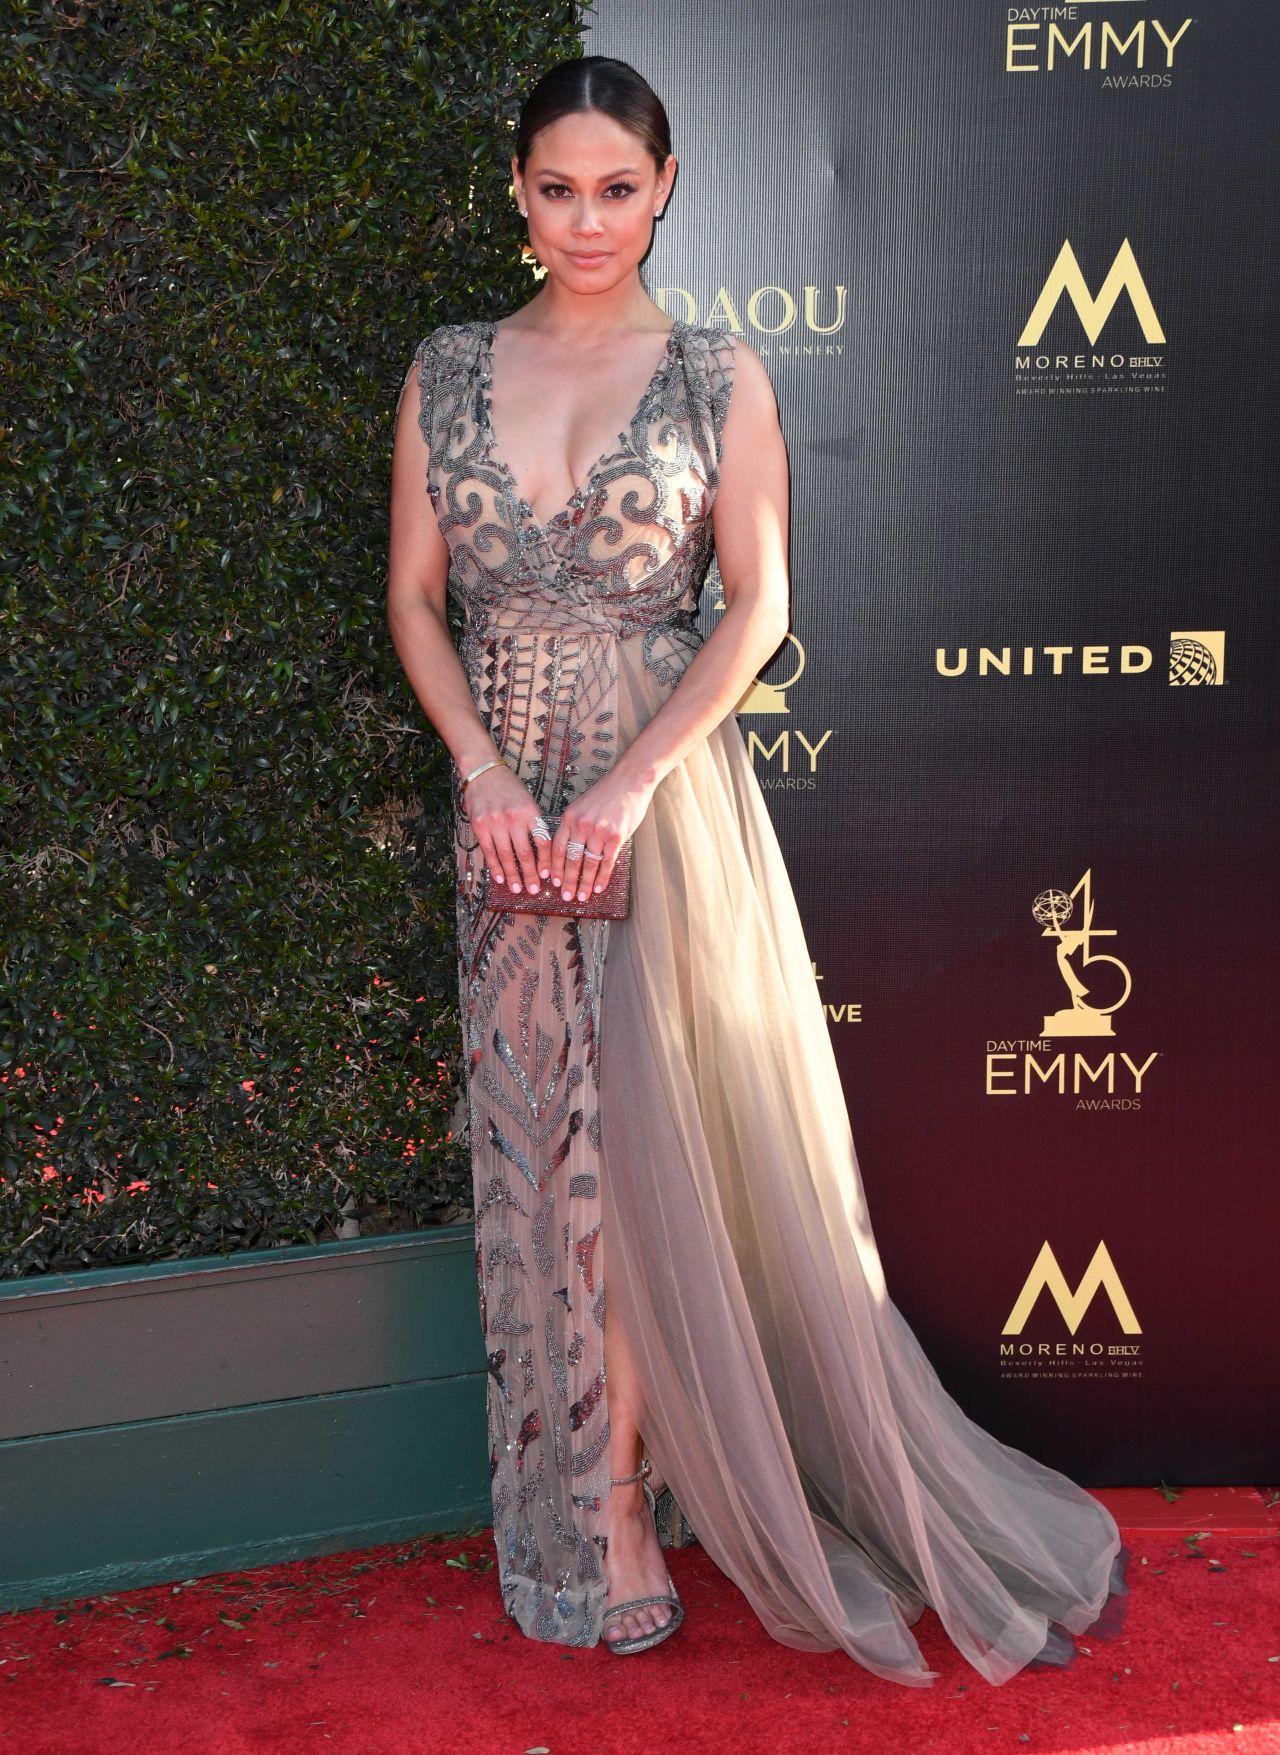 CelebMafia - Celebrity Photos, Style, GIFs, Videos Emmy Awards 2018